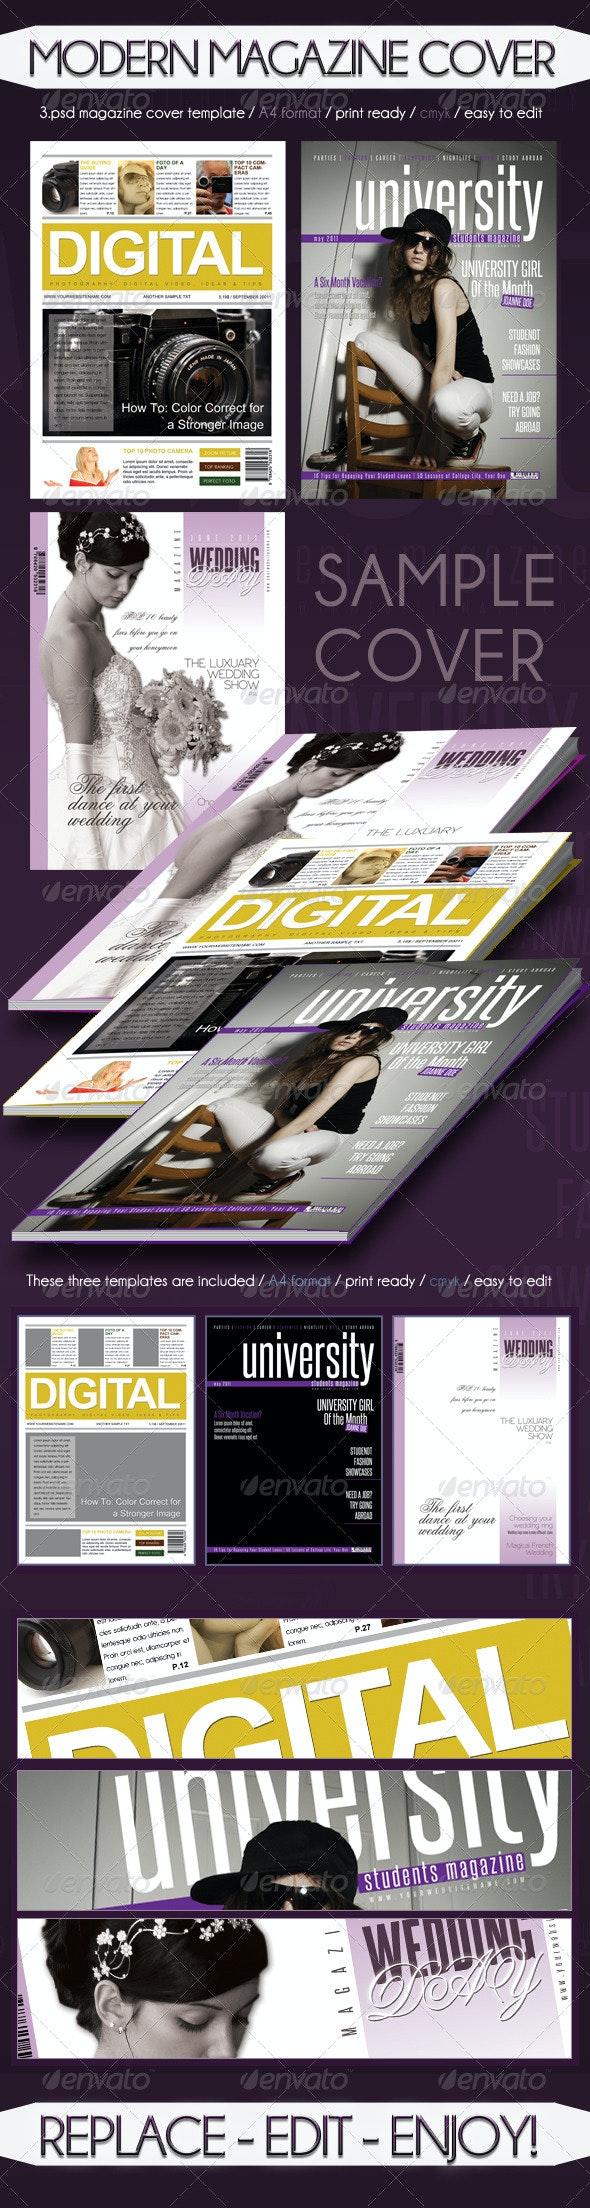 Modern Magazine Cover Template - Magazines Print Templates